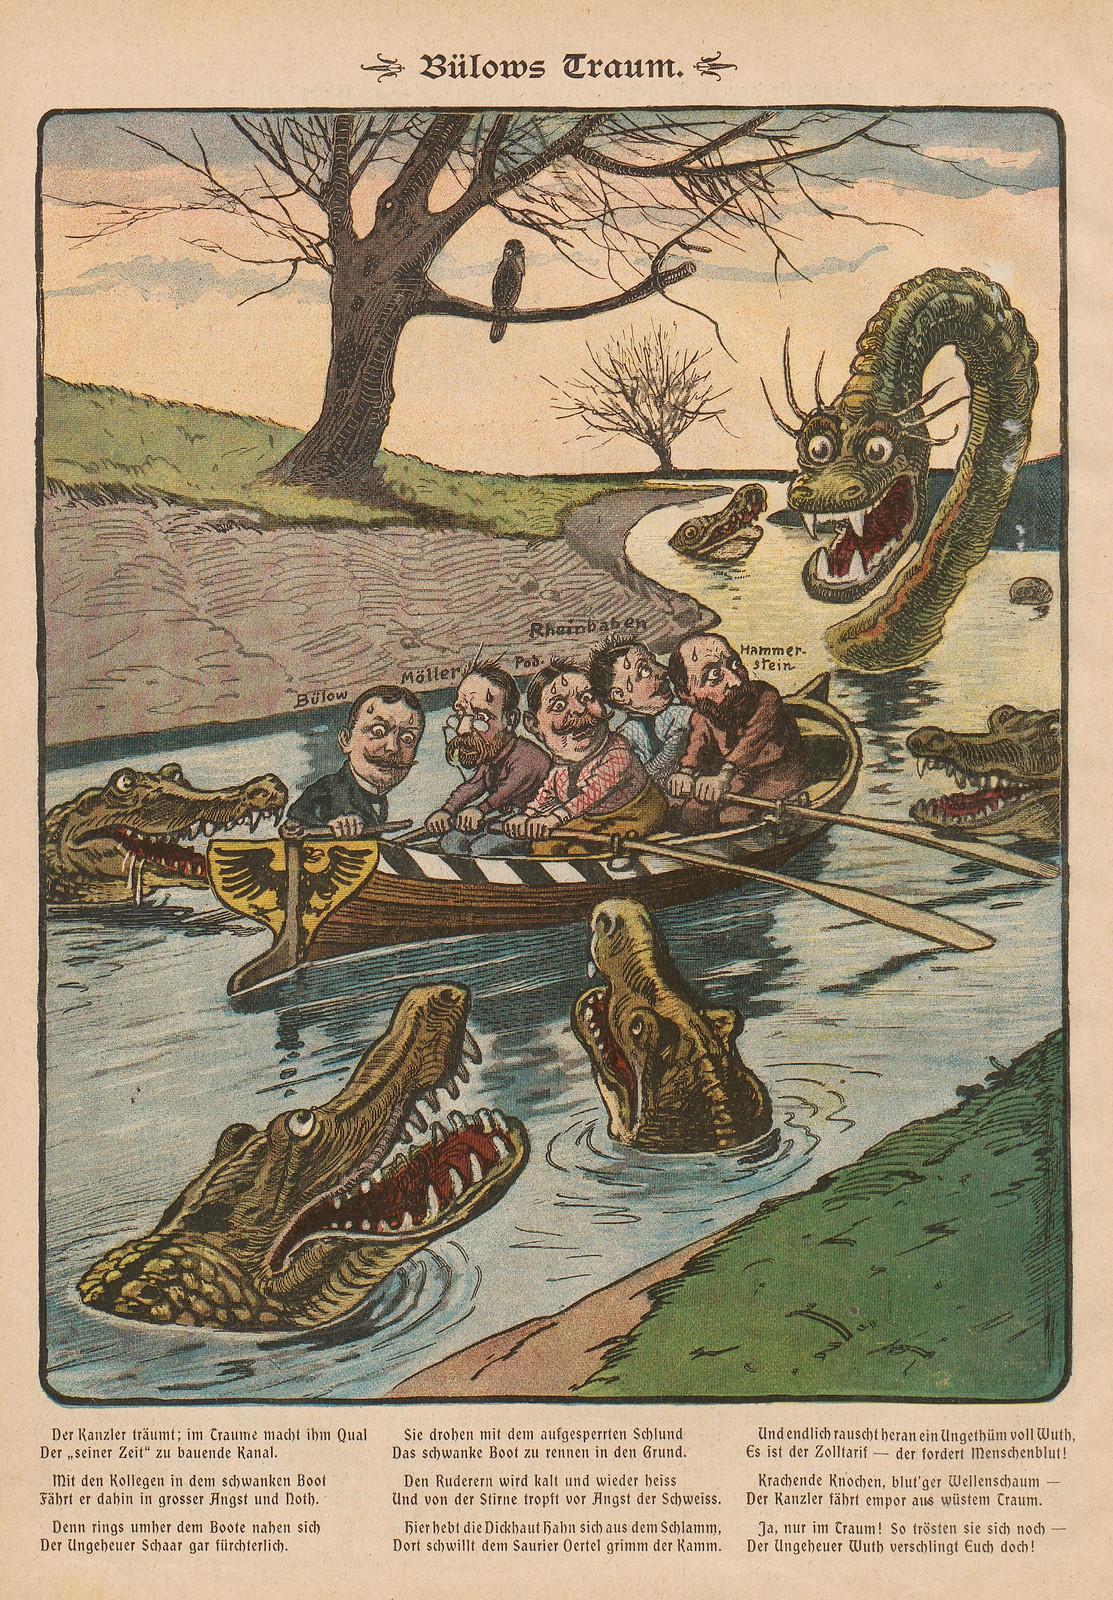 Unsigned - Bulow's dream, 1902